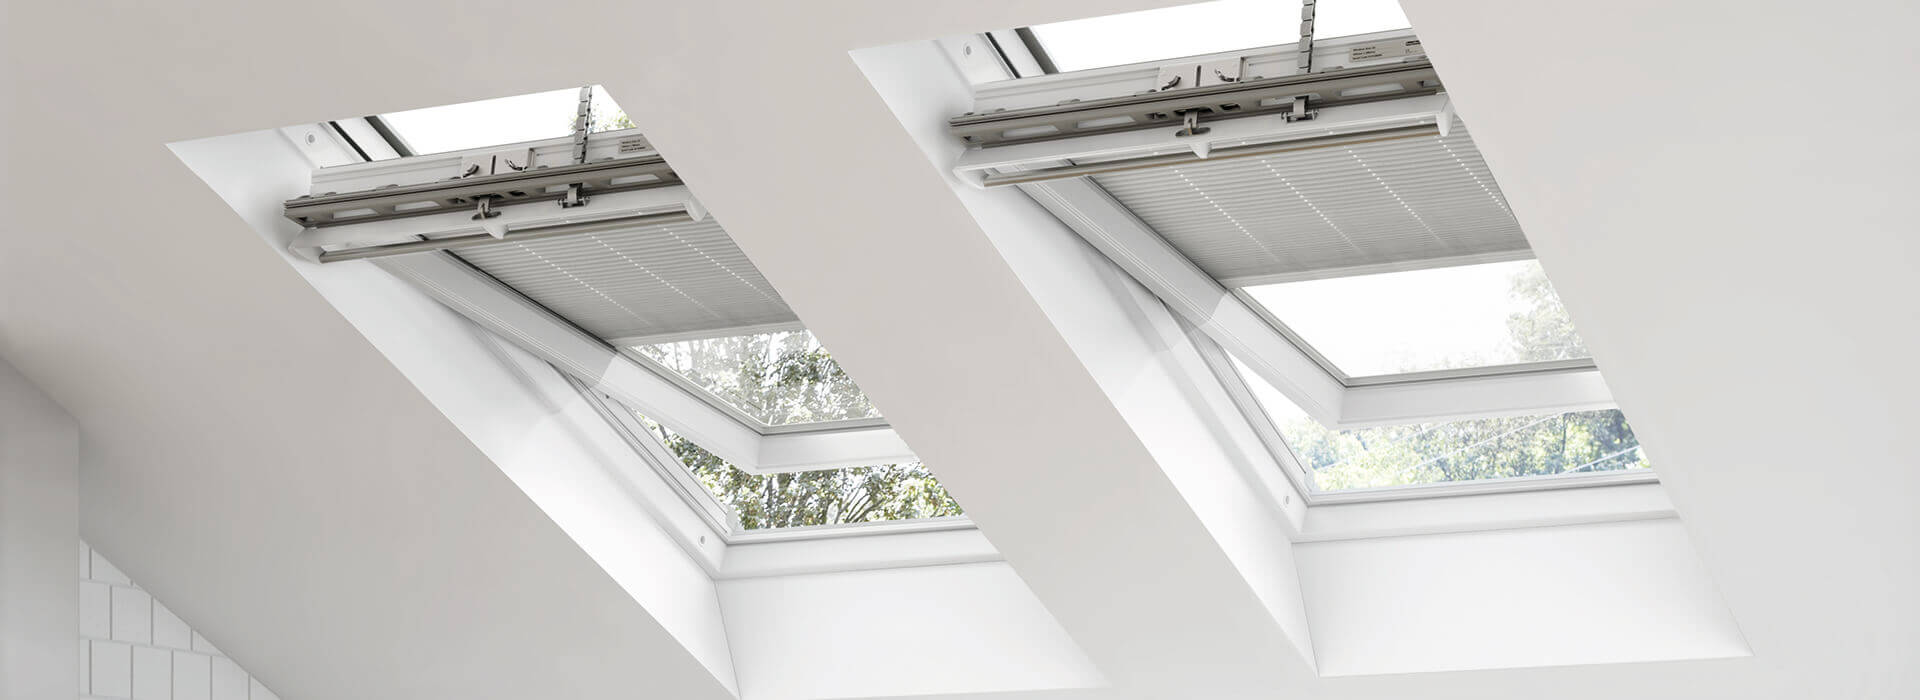 Keylite Polar White Pvc Roof Windows Keylite Roof Windows